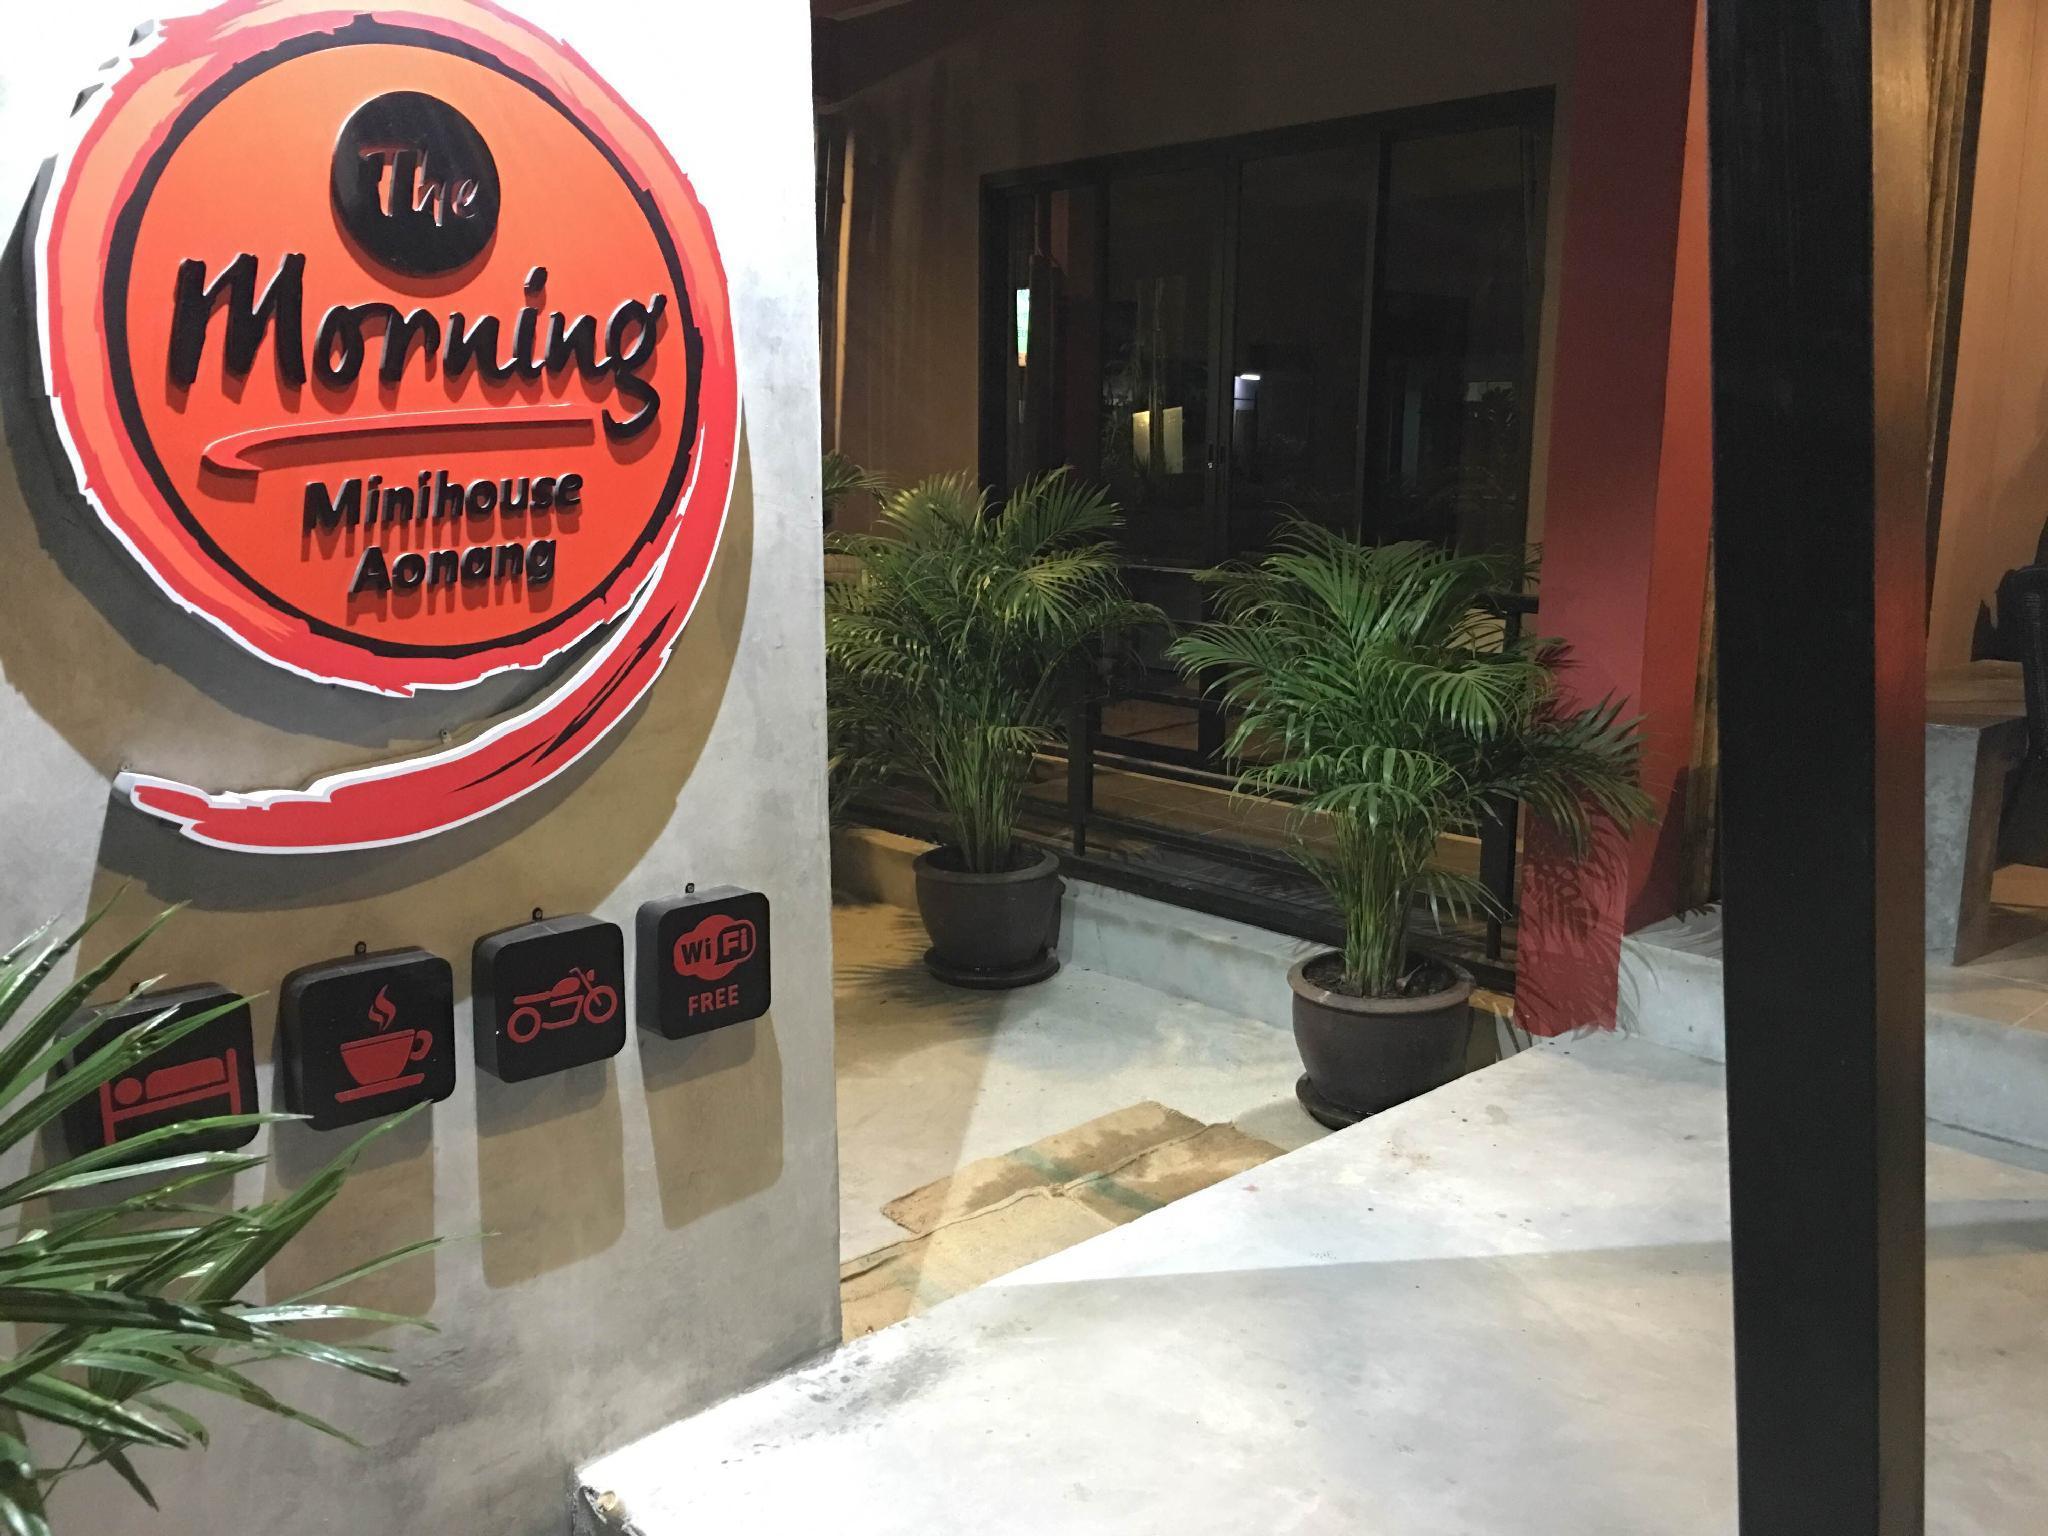 The Morning Minihouse Aonang เดอะ มอนิ่ง มินิเฮ้าส์ อ่าวนาง